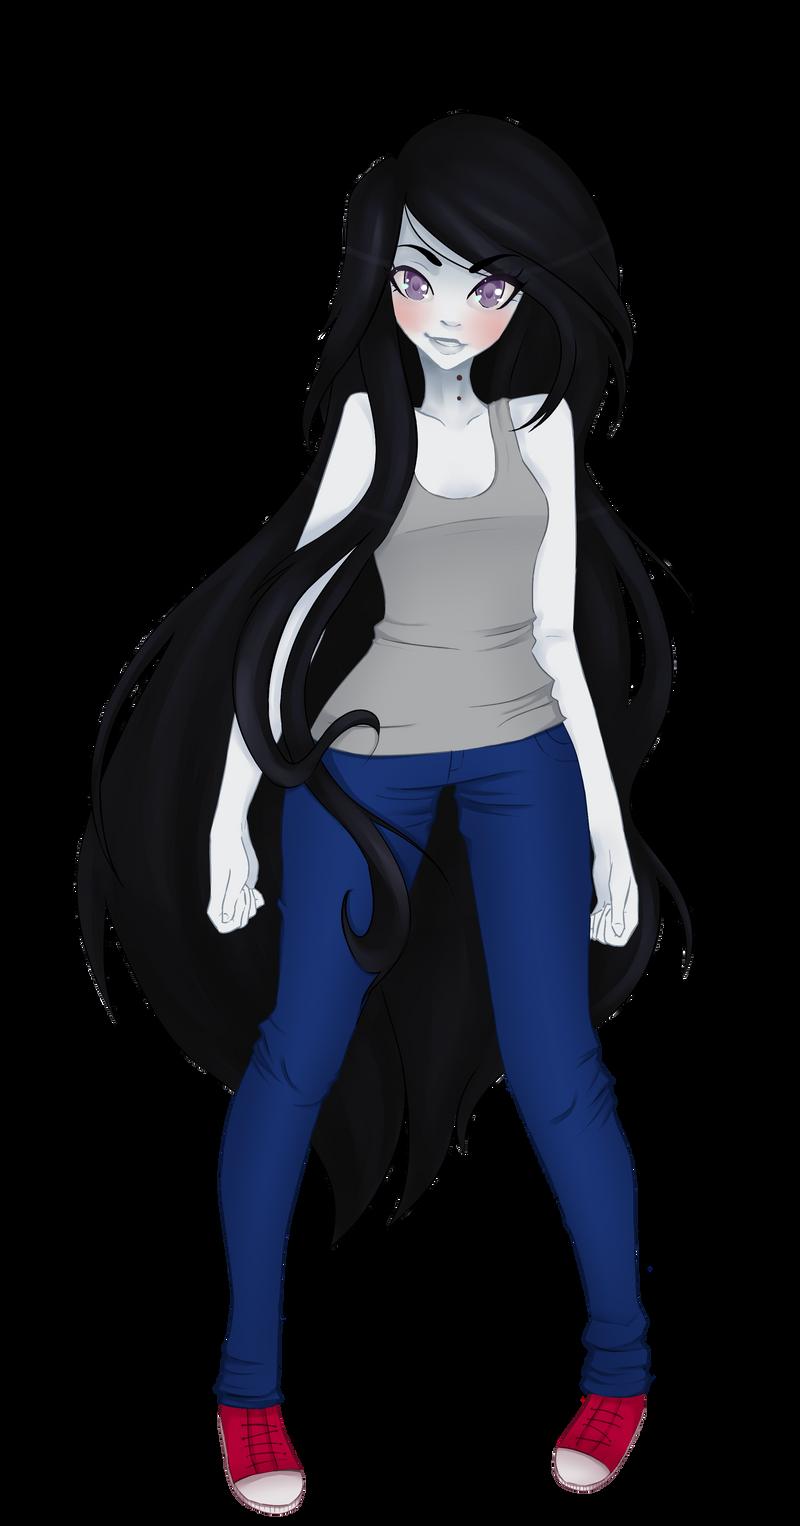 Marceline by xXKefirXx on DeviantArt